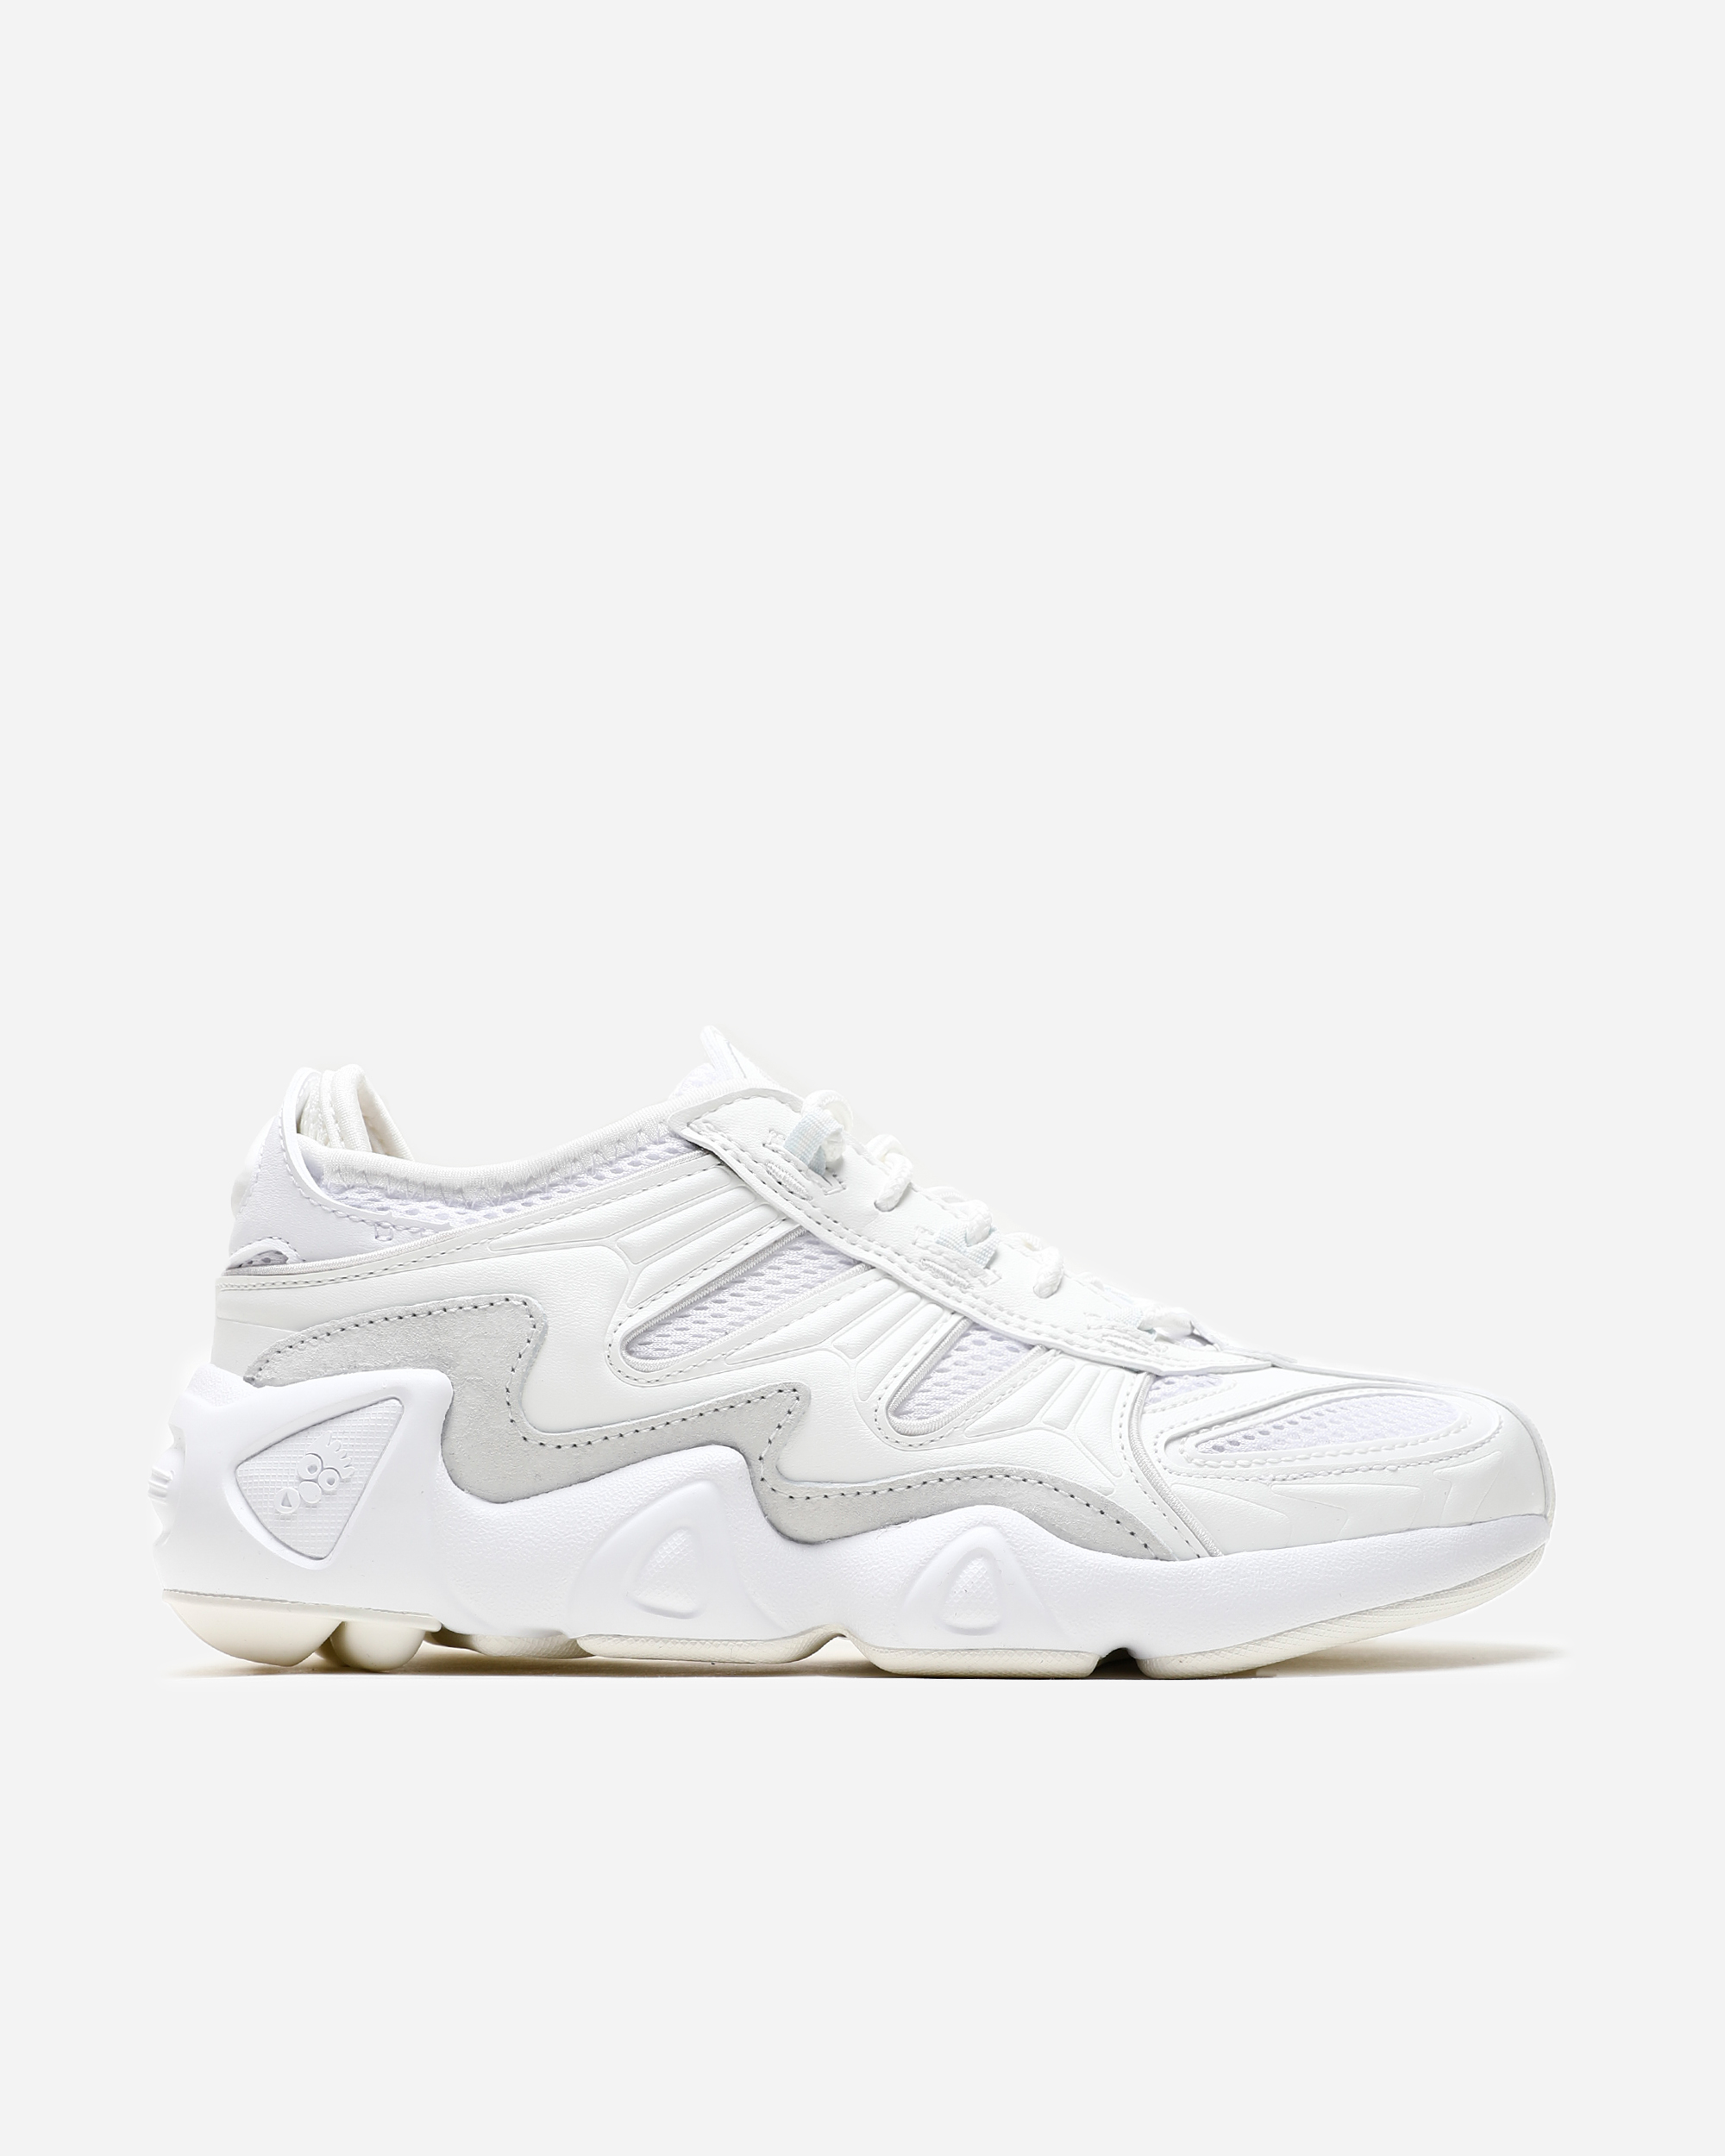 Adidas Originals Fyw S 97 White Off White Ef2042 Naked